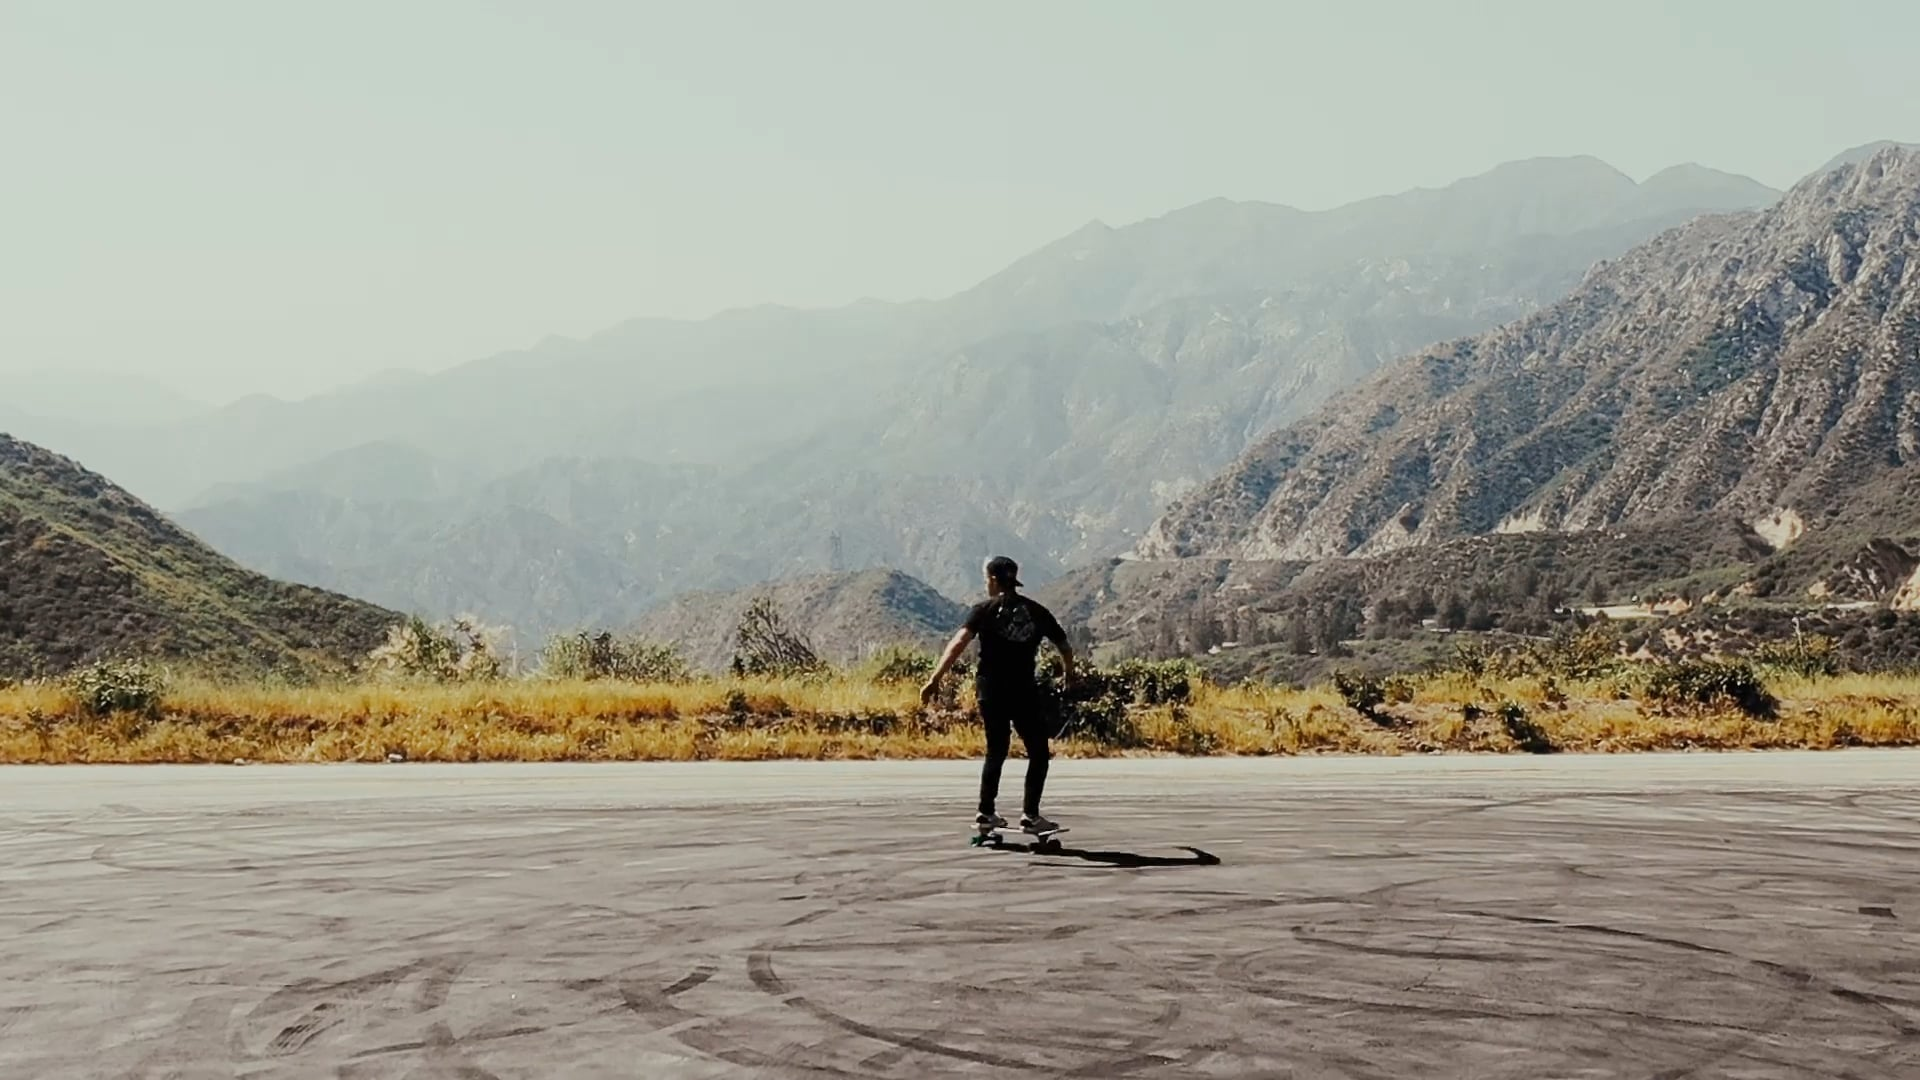 Skating in the San Gabriel Mountains